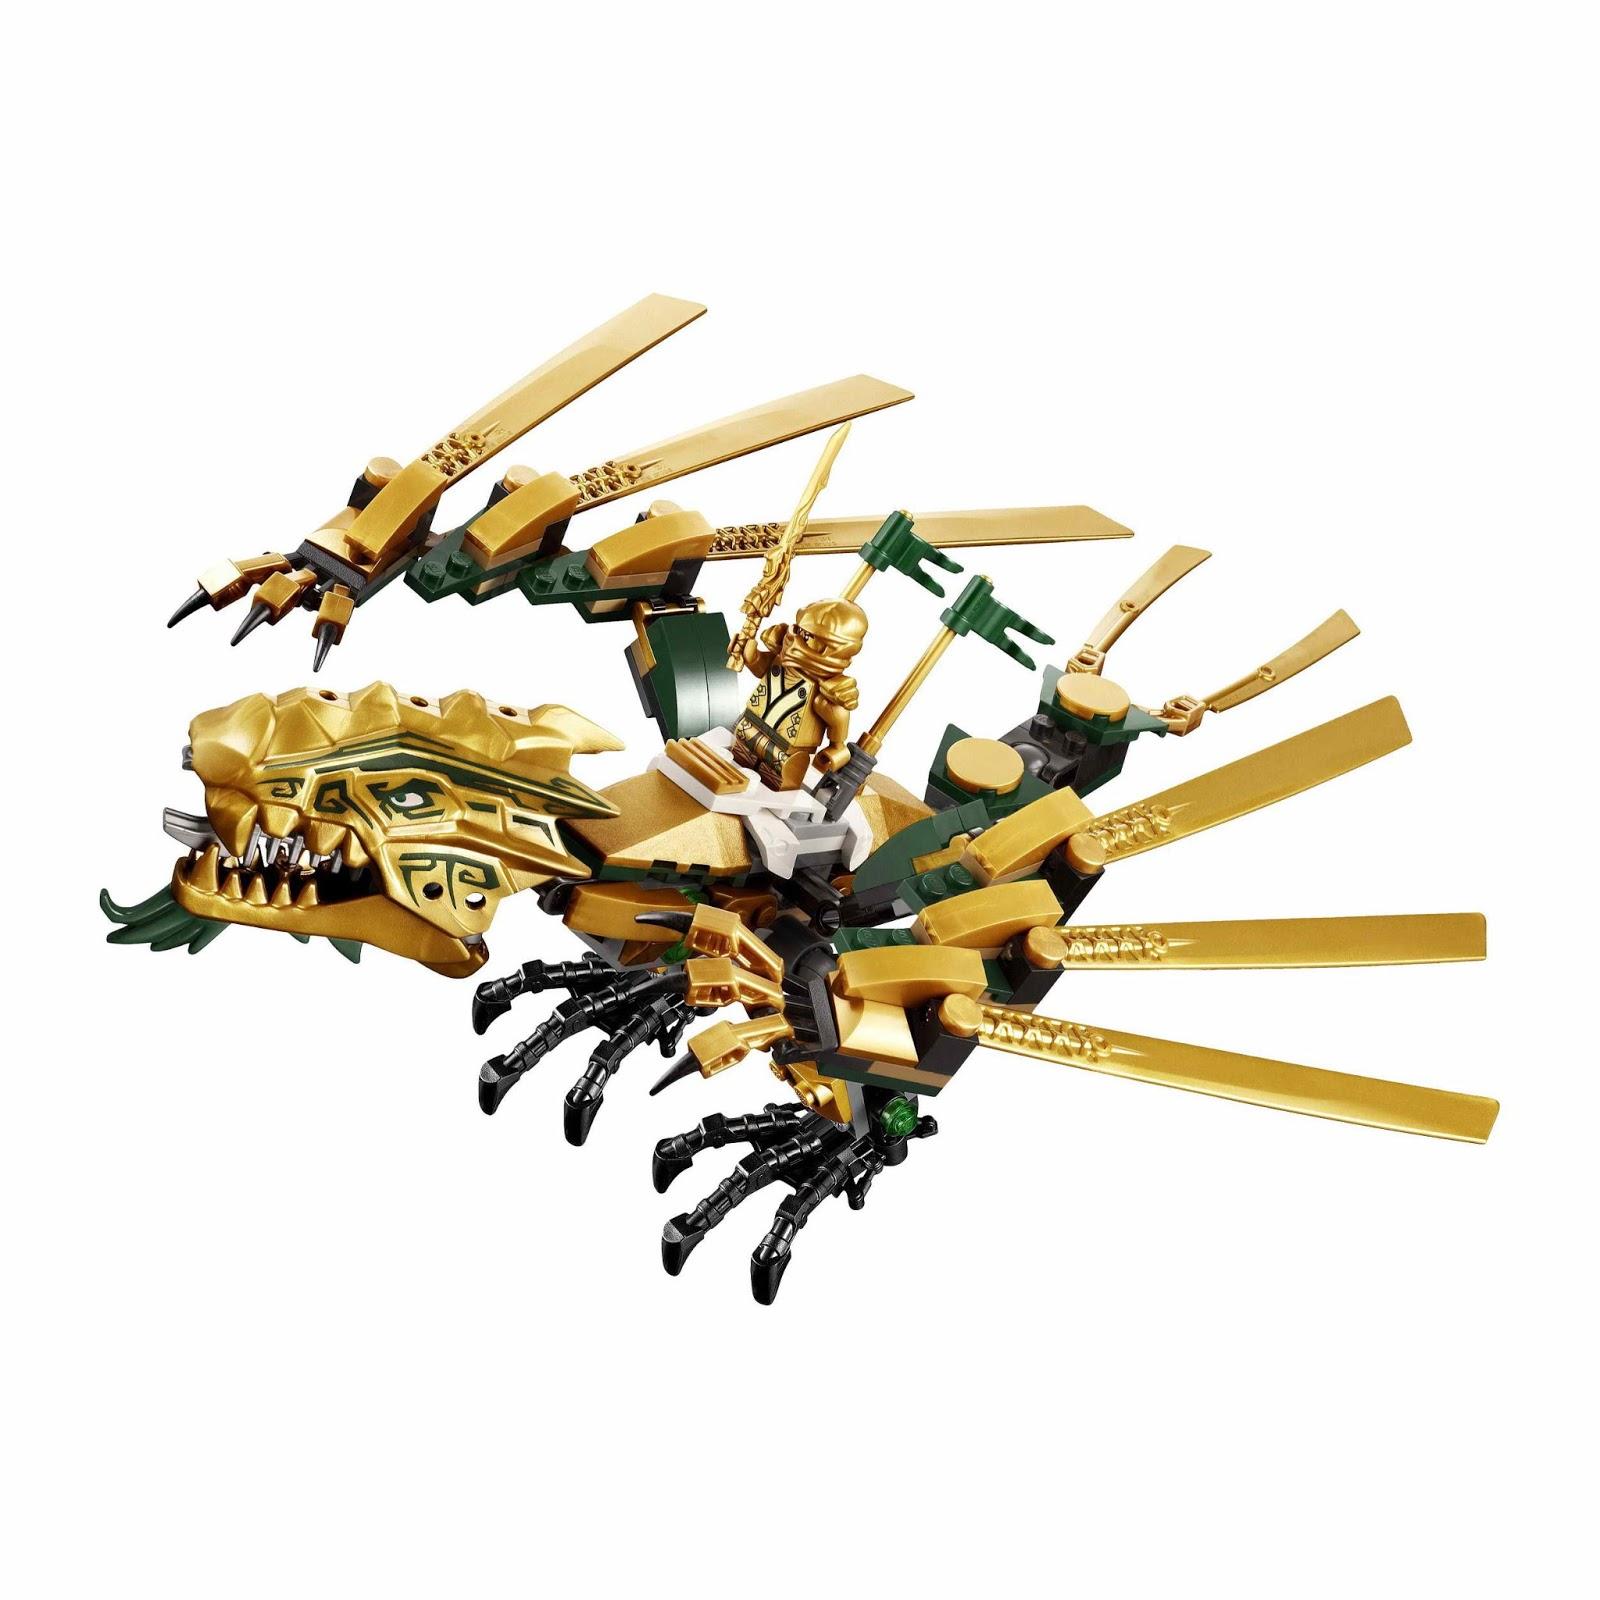 Repubblick set database lego 70503 the golden dragon - Dragon ninjago lego ...